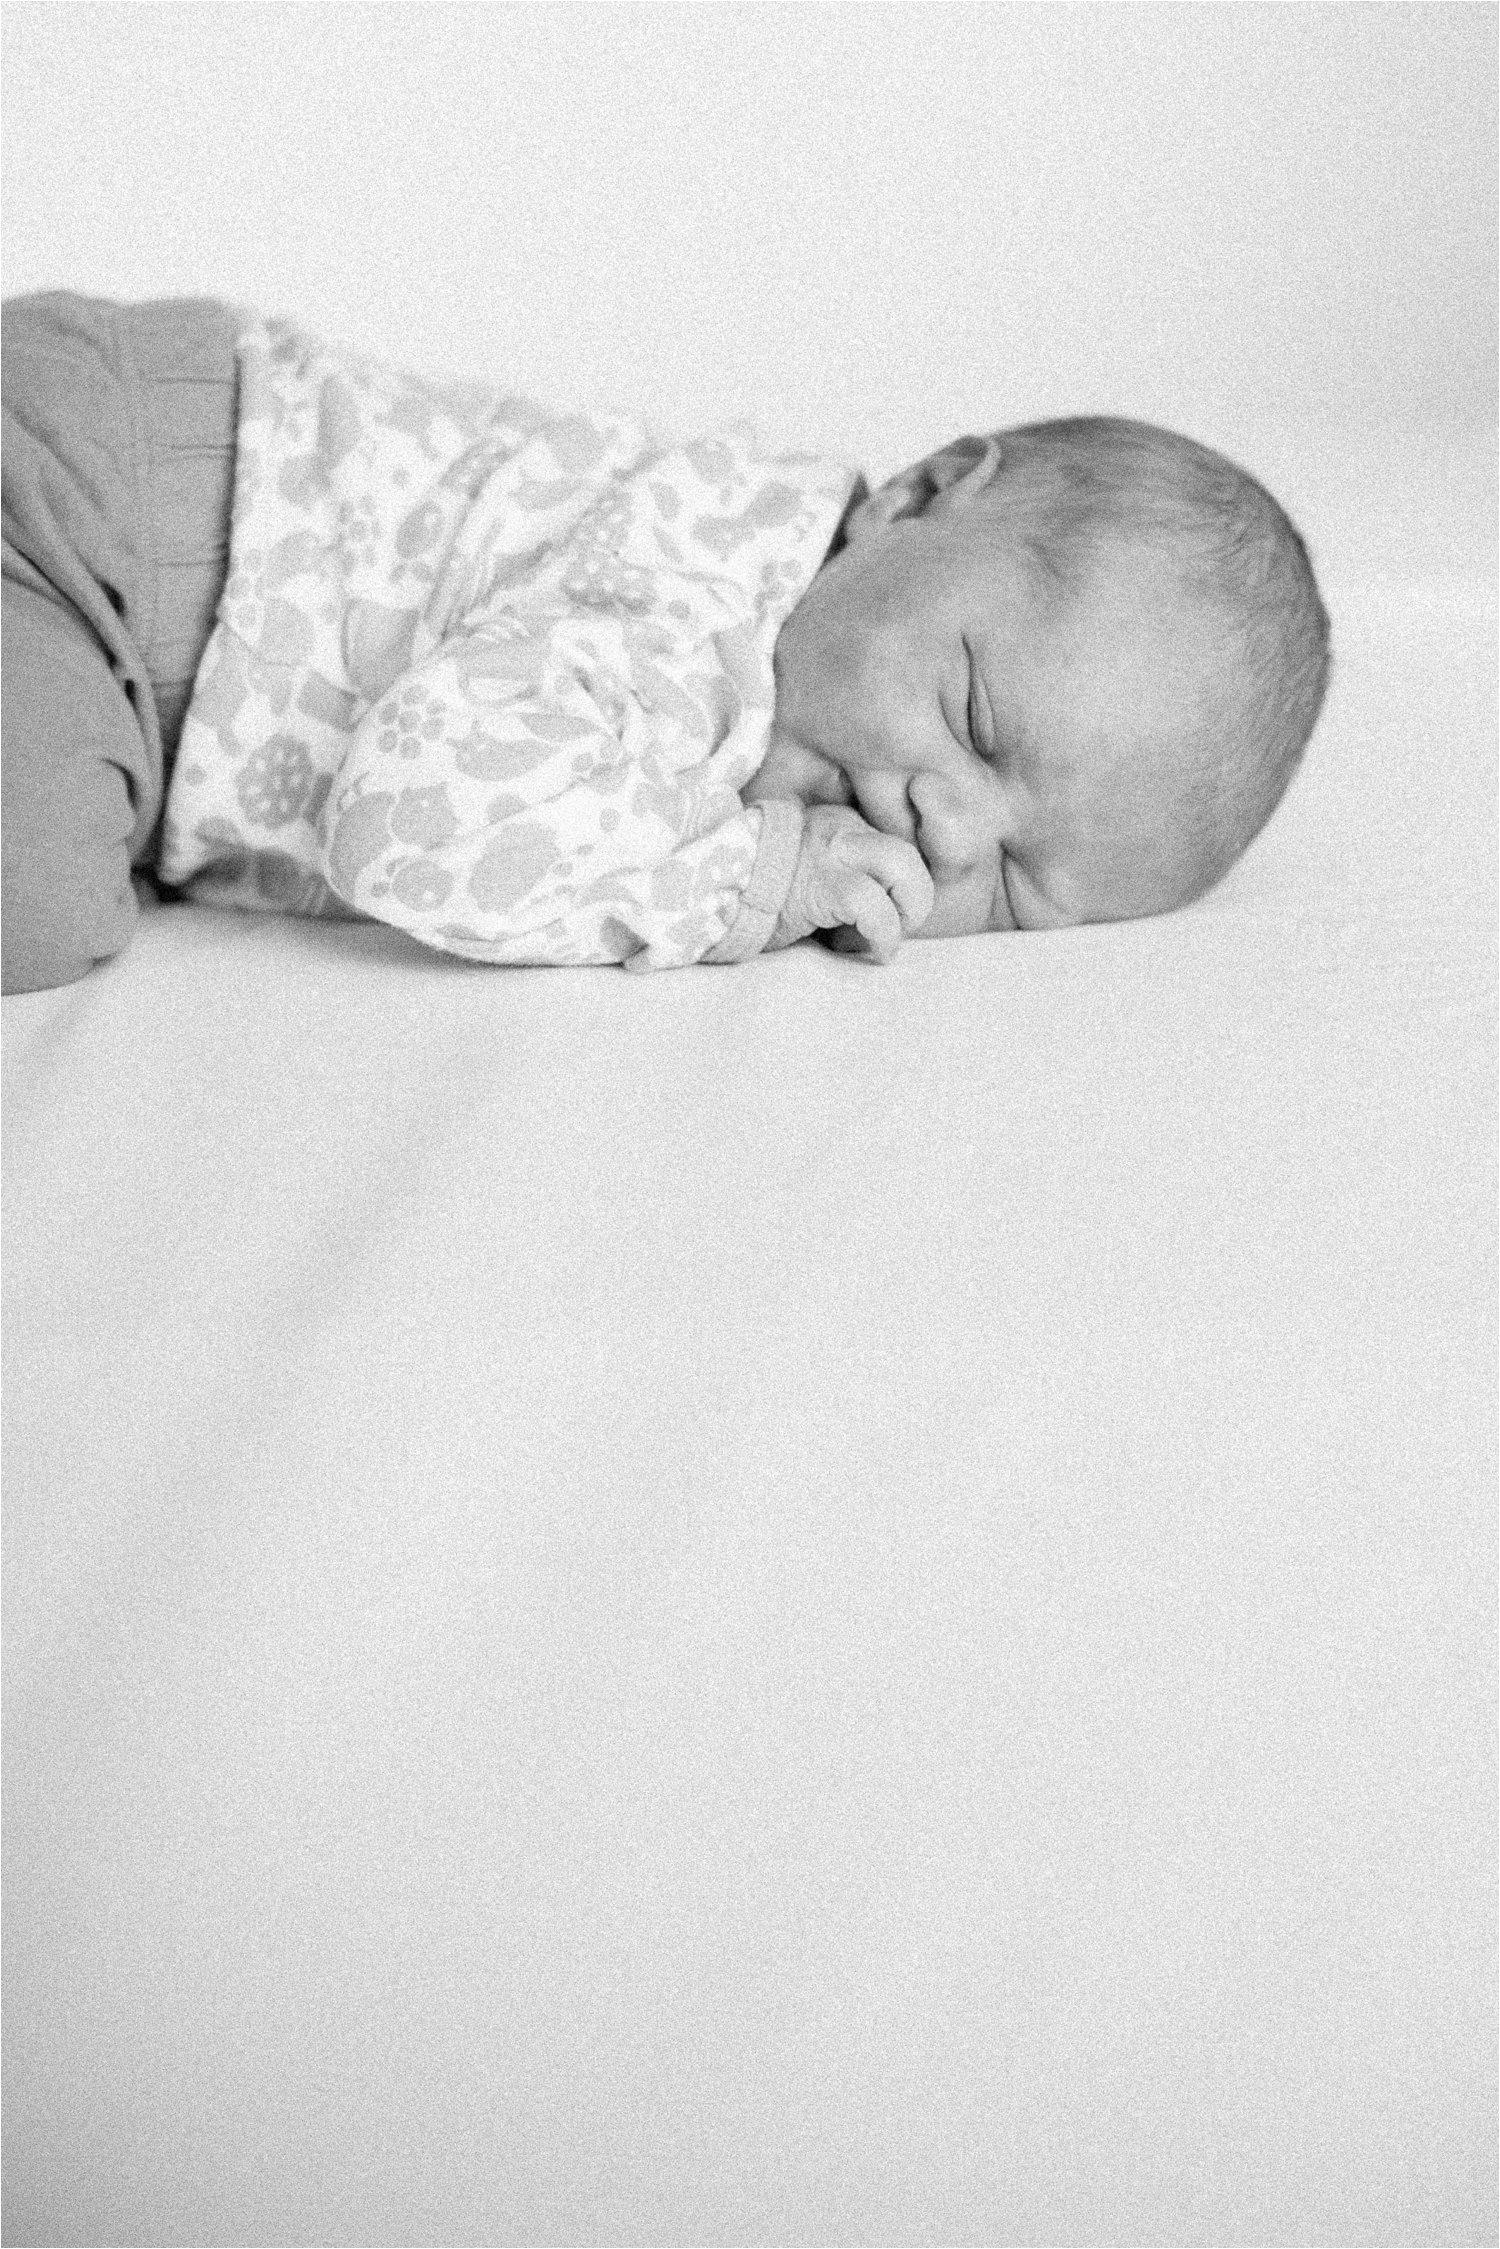 Als borstvoeding niet lukt